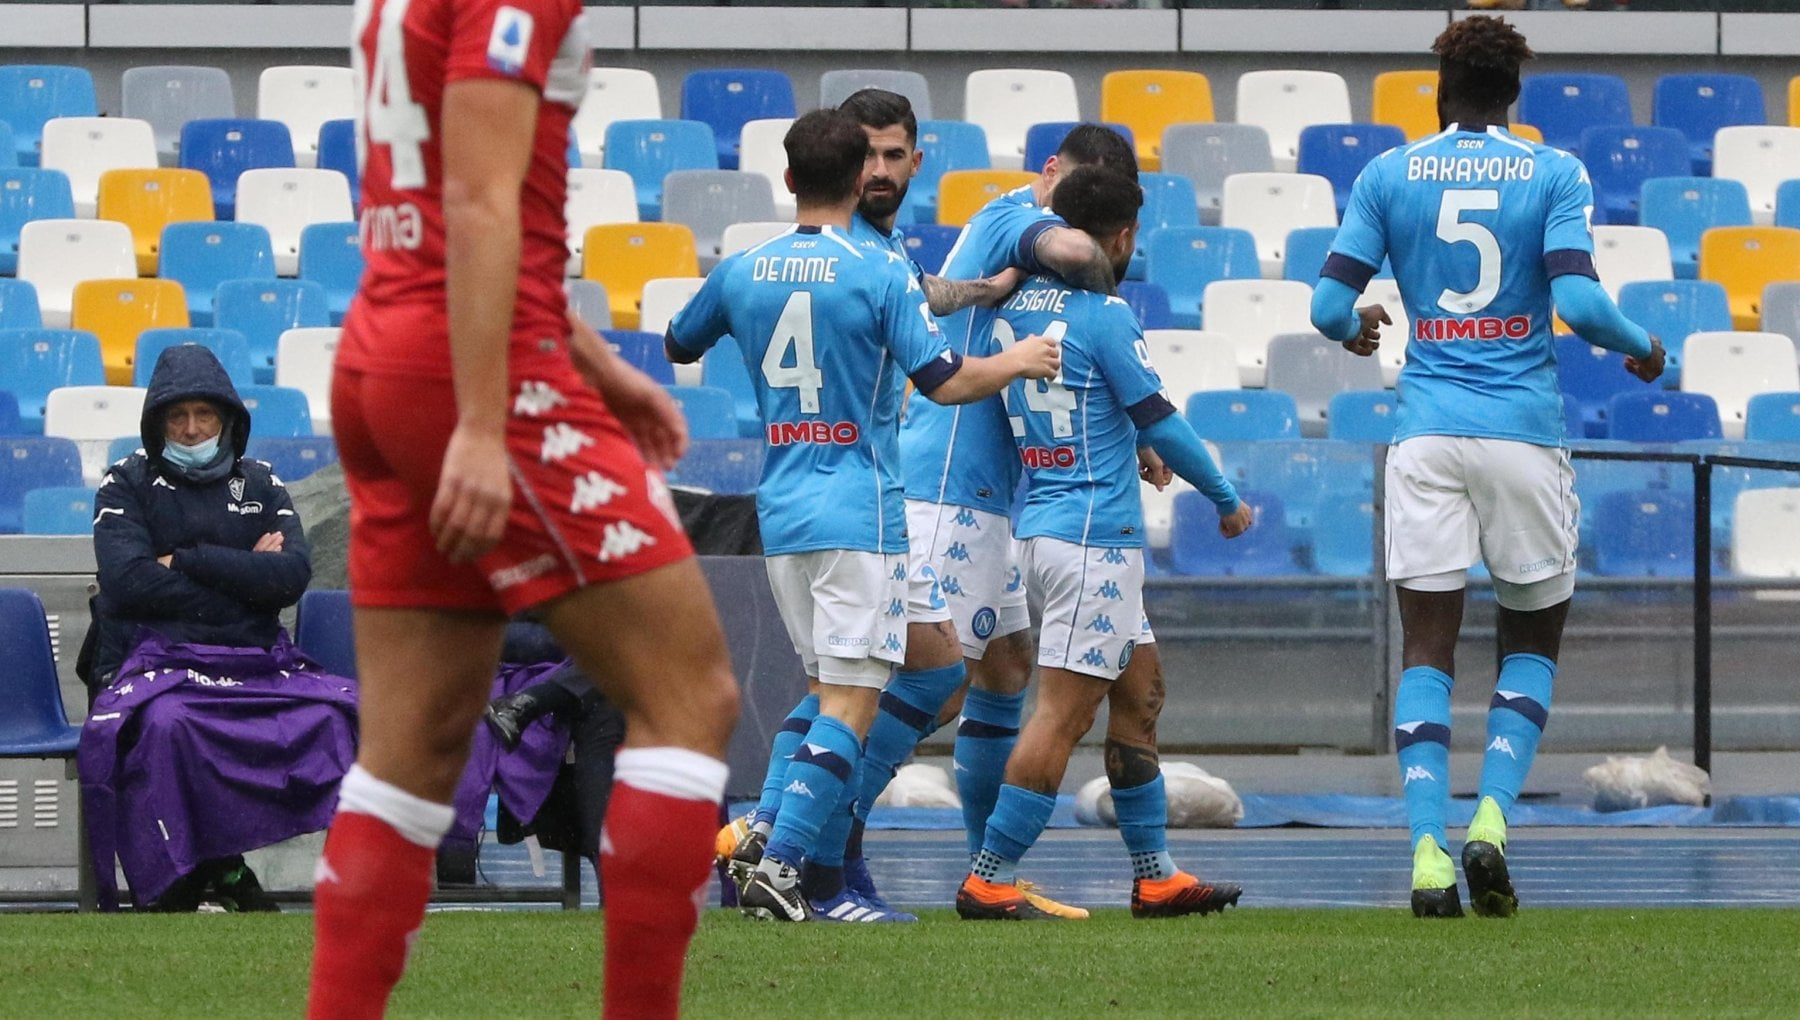 Napoli Fiorentina 6 0 azzurri a valanga Insigne fa doppietta